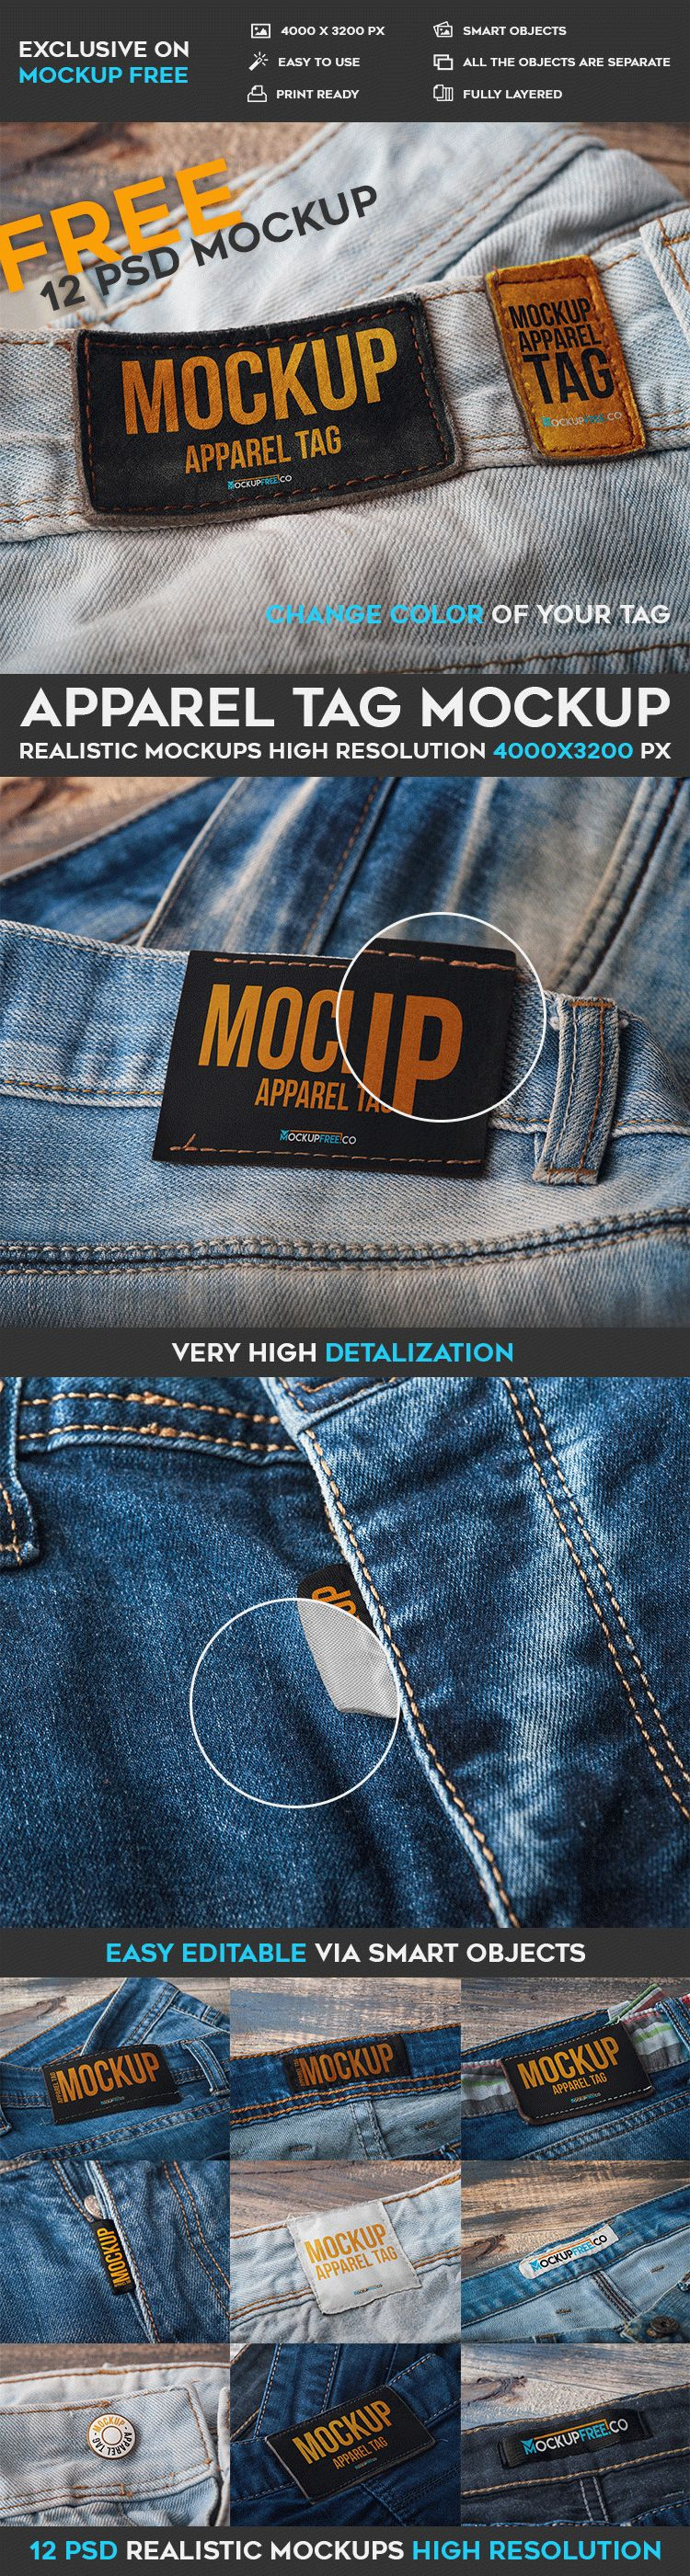 Apparel Tag - 12 Free PSD Mockups